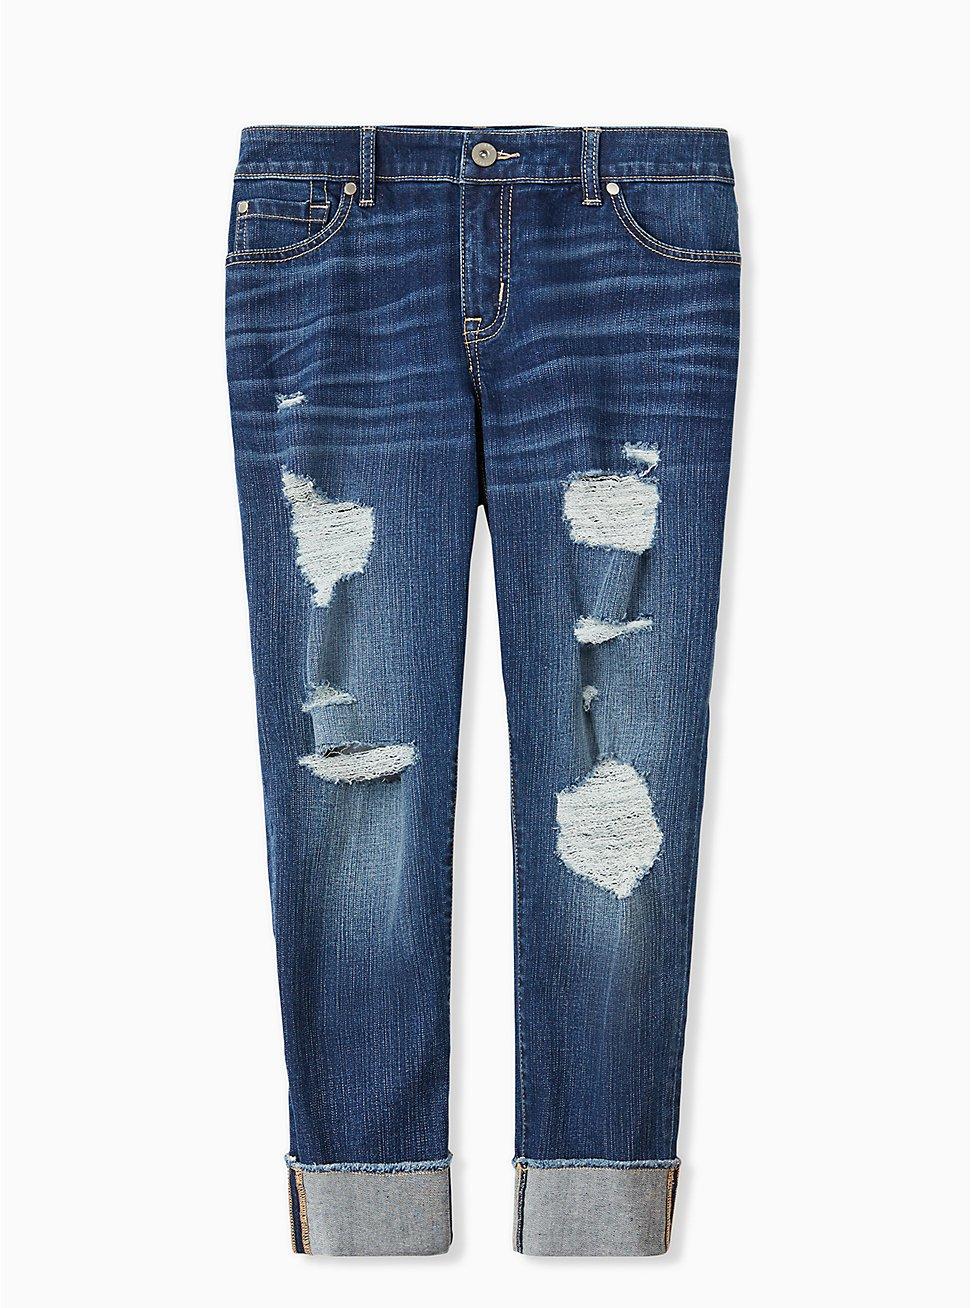 Crop Boyfriend Jean - Vintage Stretch Medium Wash, BACK COUNTRY, hi-res